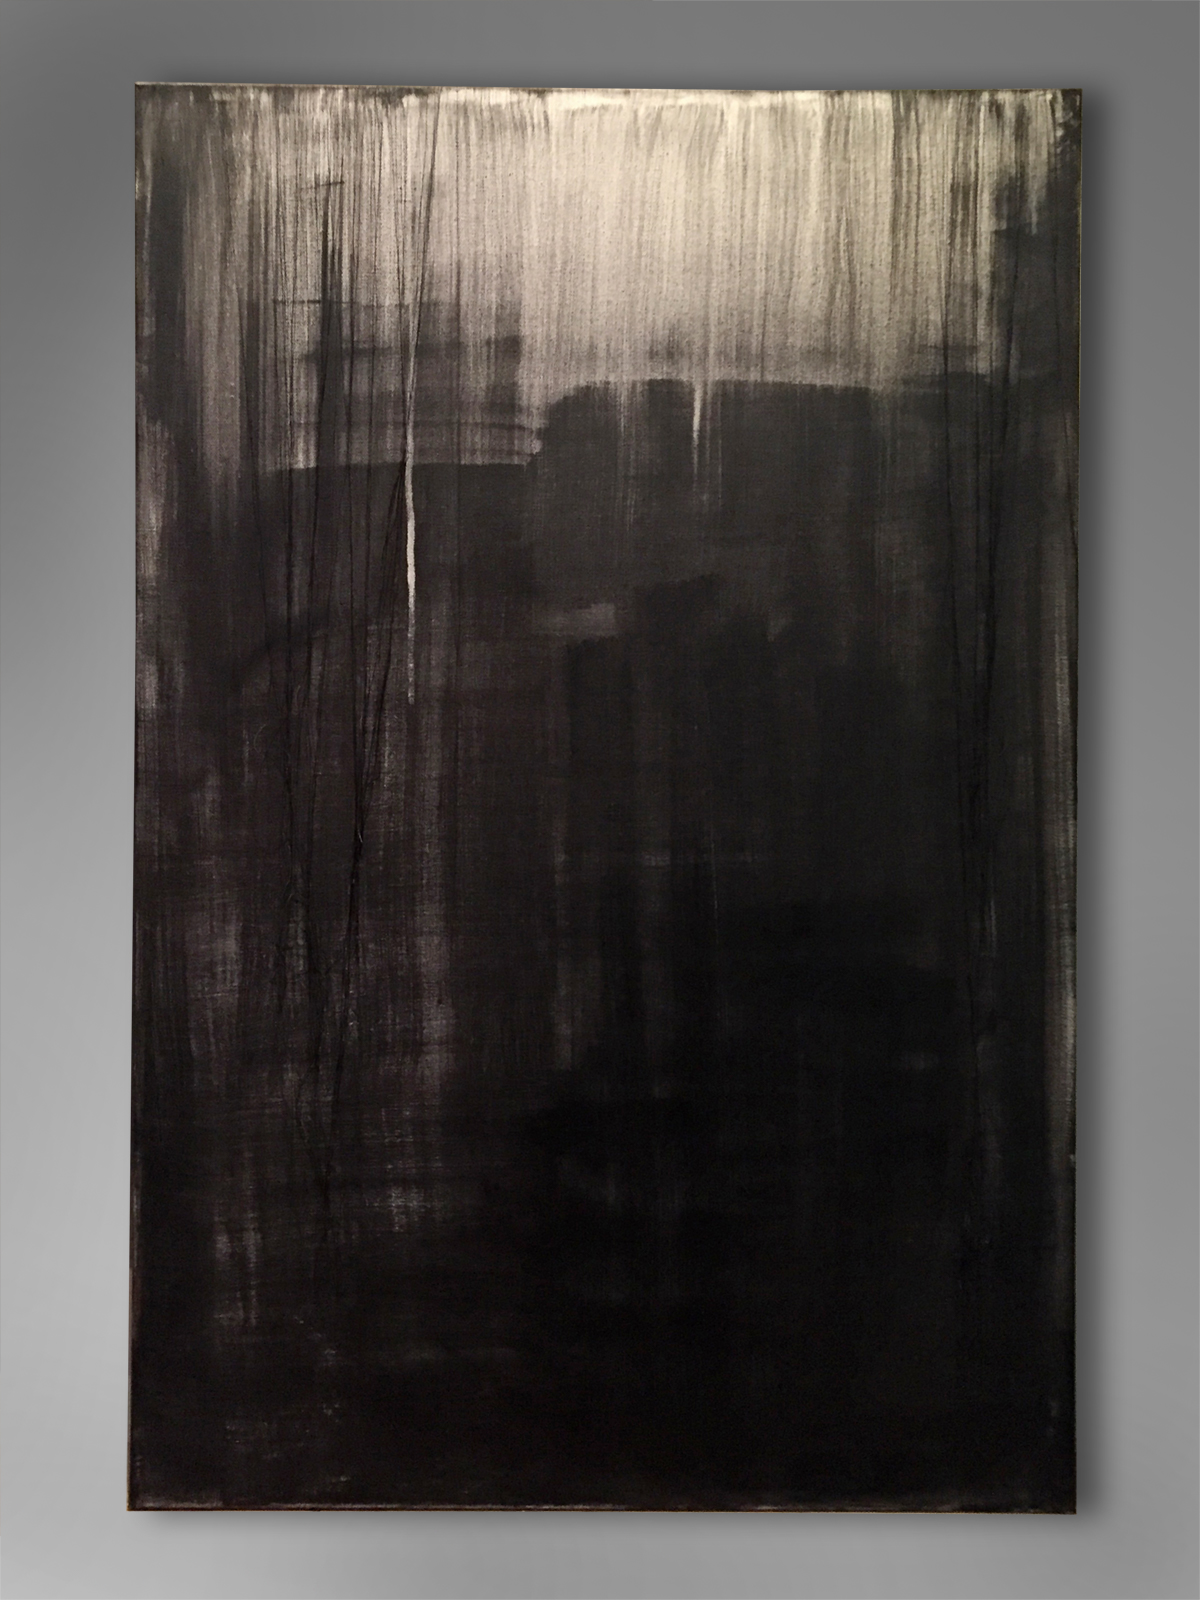 MOONLIGHT   Acrylic, canvas, thread  36 x 24 Inches